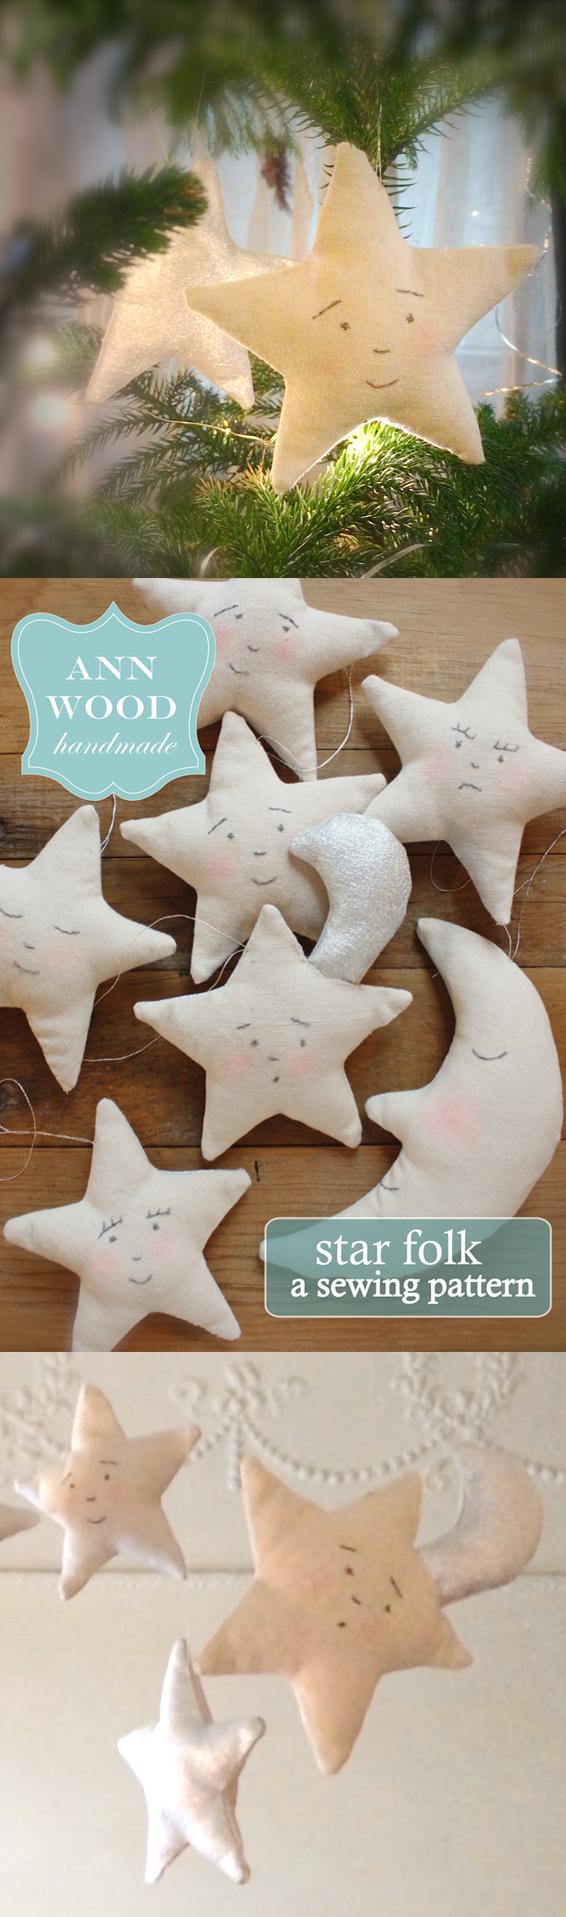 starfolk sewing pattern